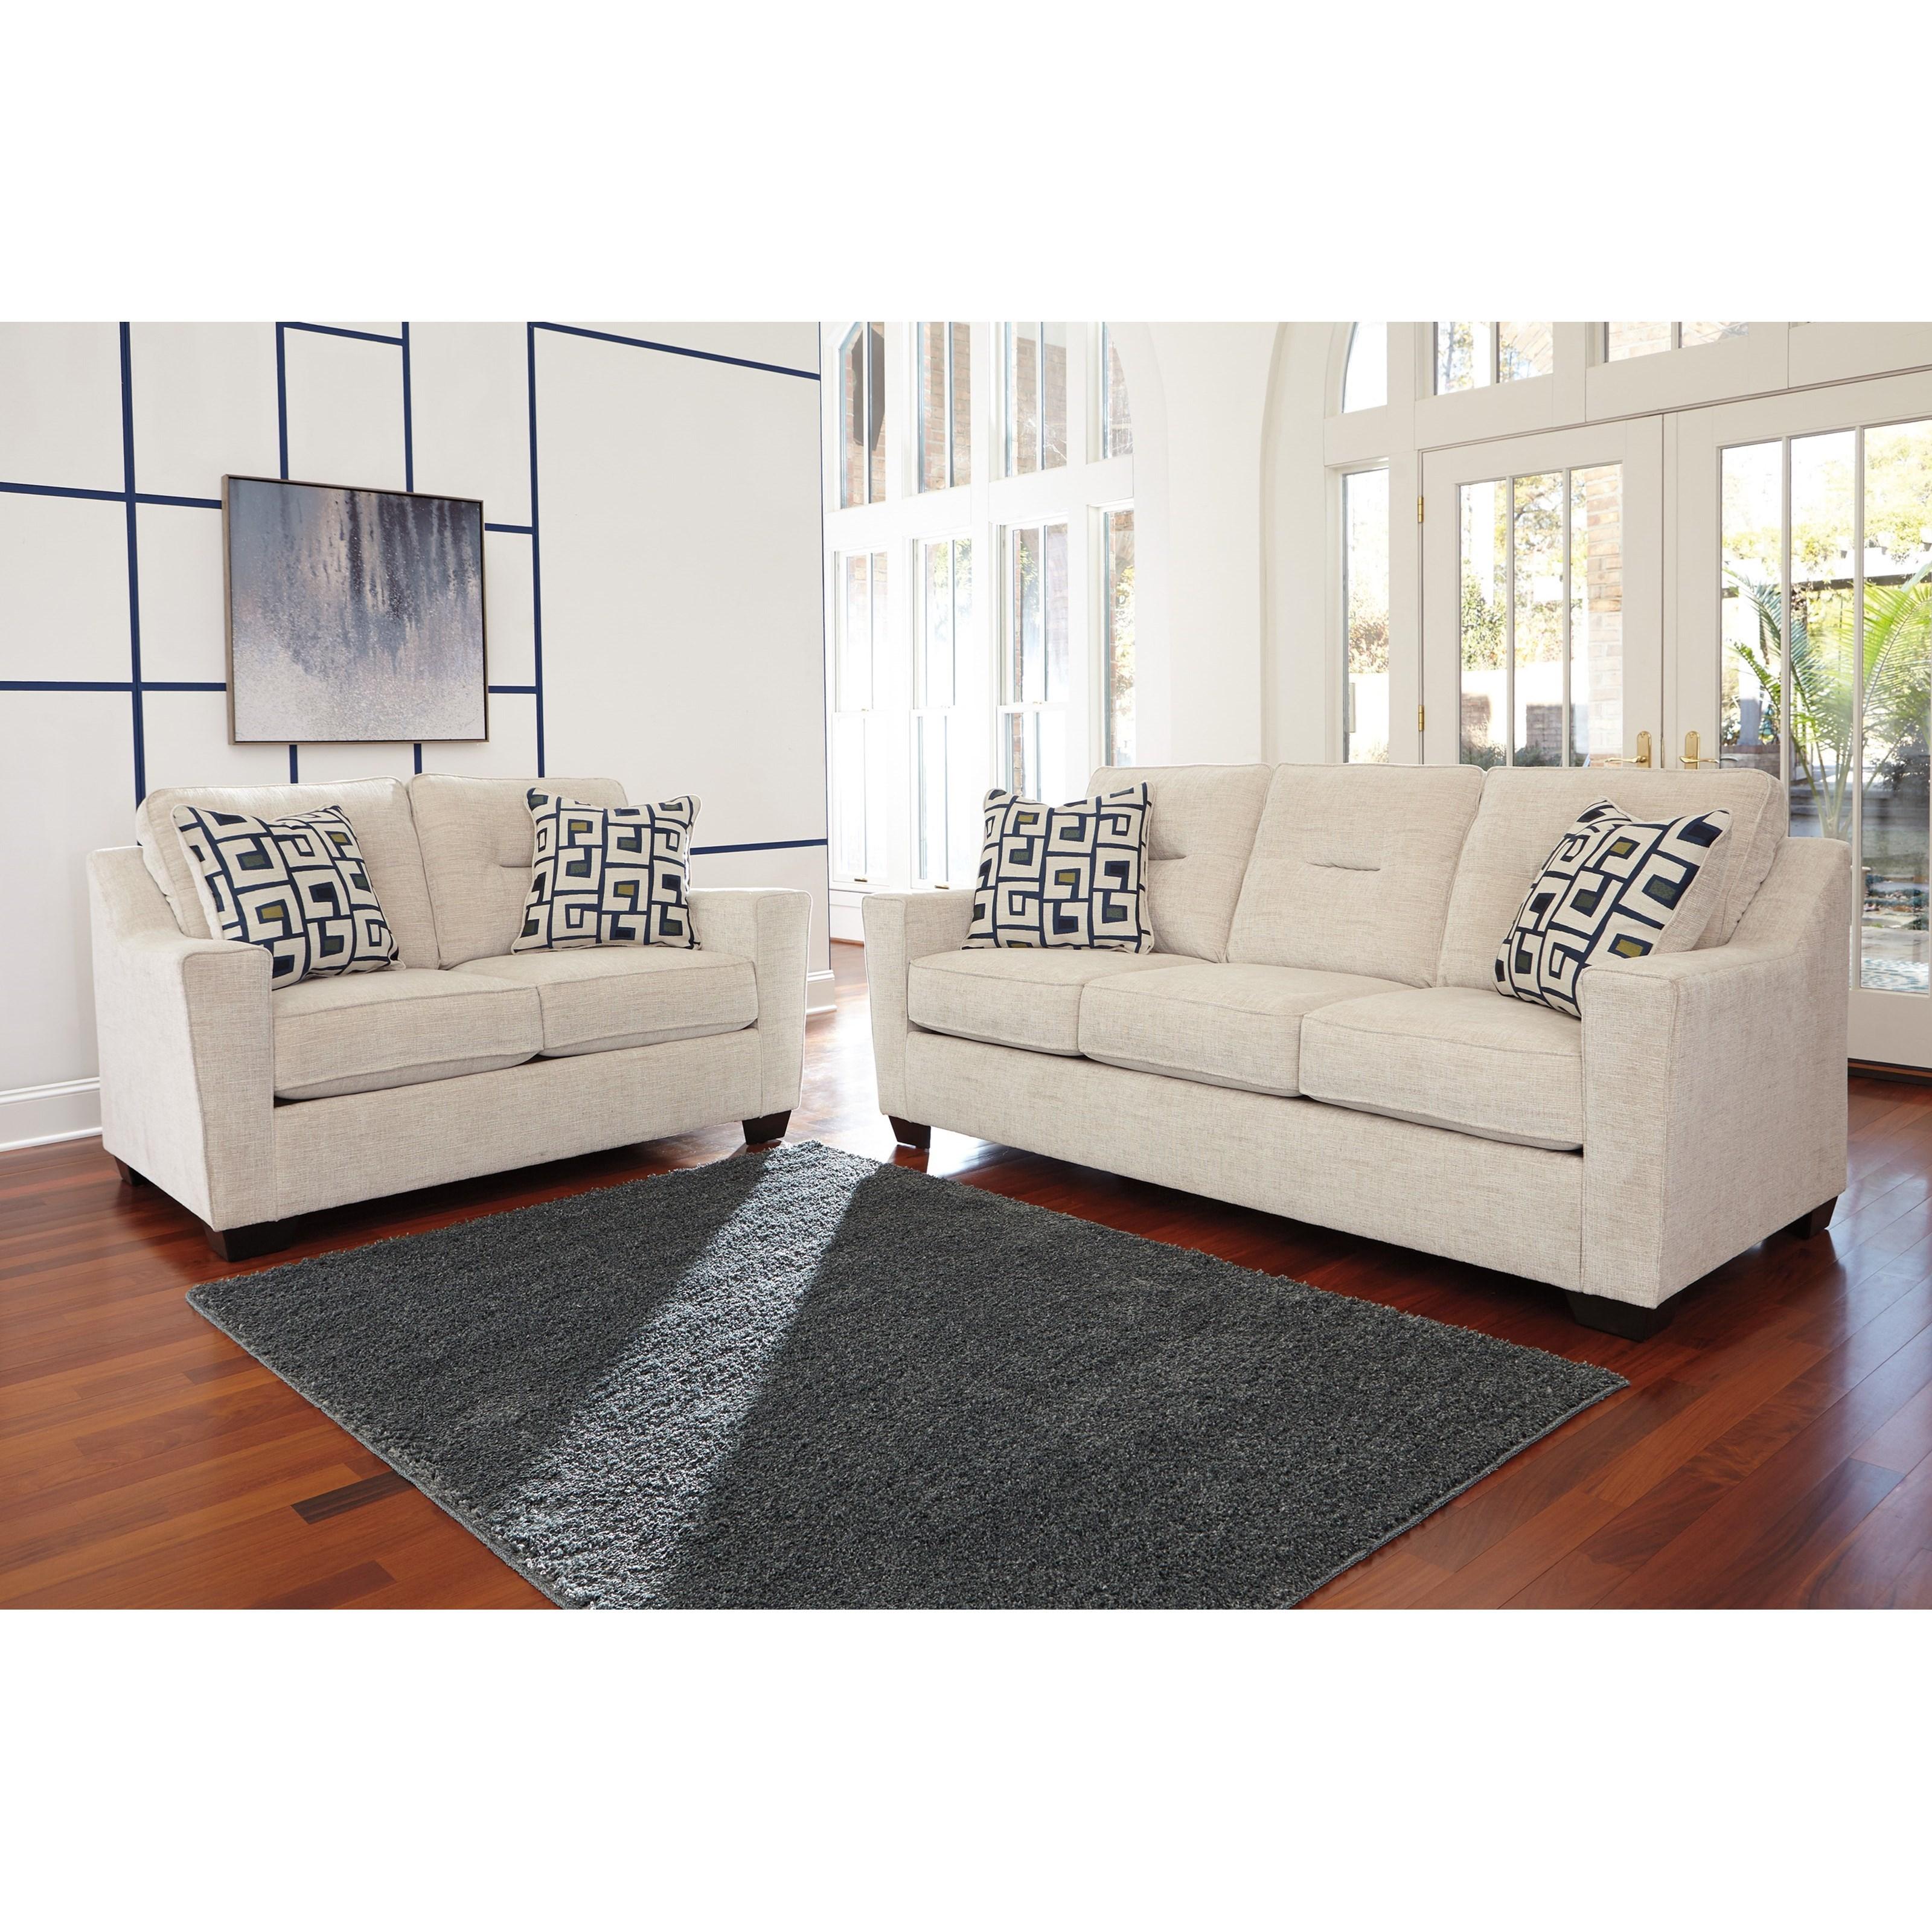 Ashley Furniture Cerdic Stationary Living Room Group   Becker Furniture  World   Stationary Living Room Groups